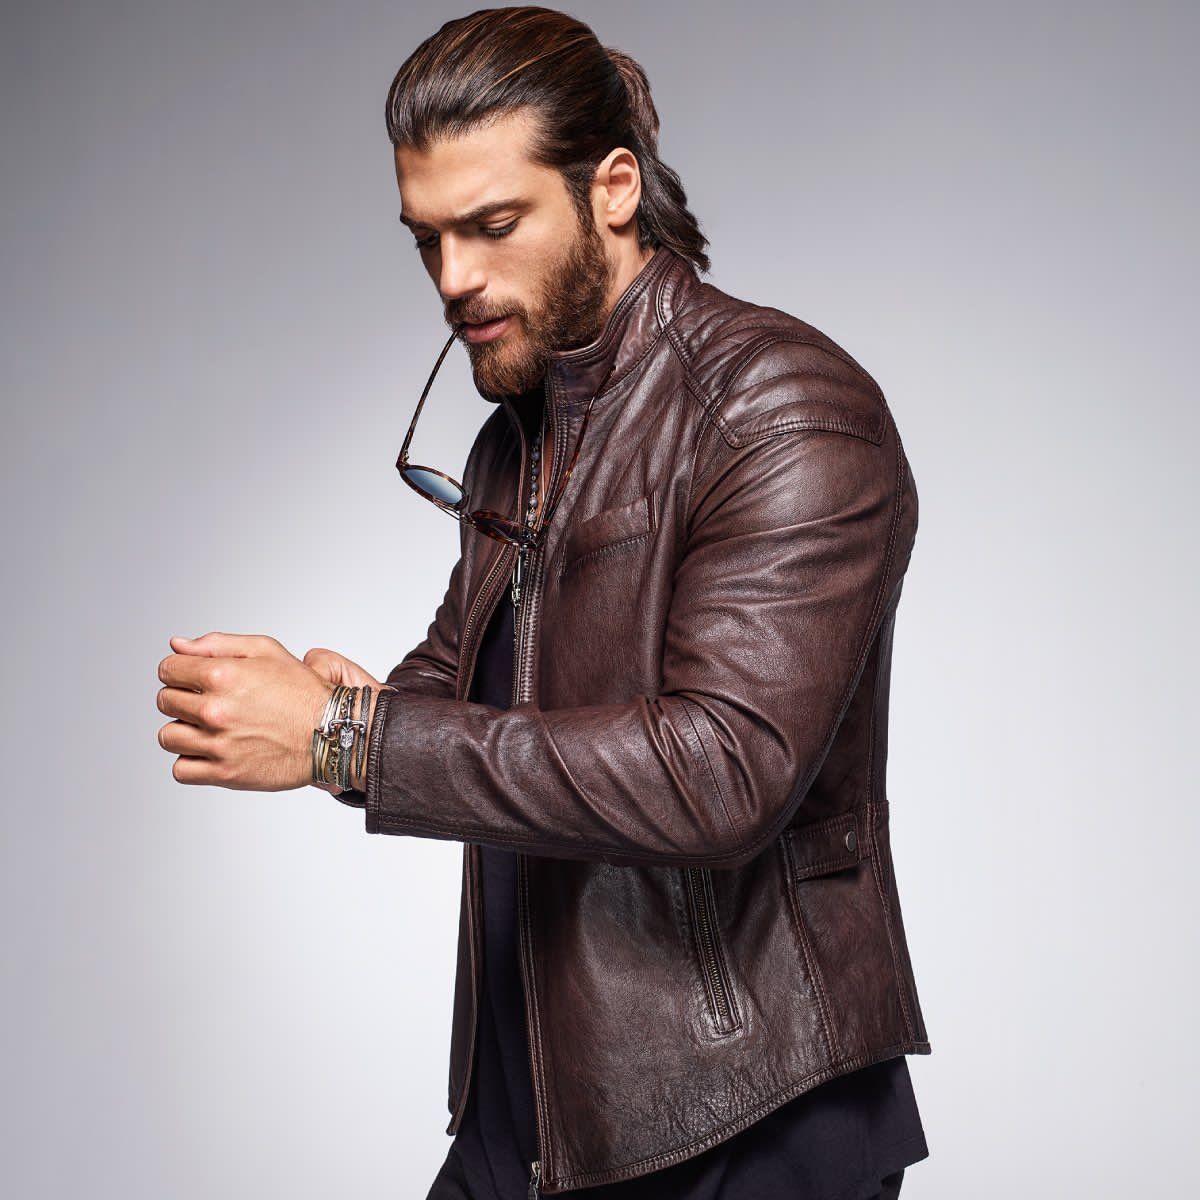 Pin By Samson On The Best Turkish Actors Actresses Stylish Men Handsome Leather Jacket Men Stylish Men [ 1200 x 1200 Pixel ]